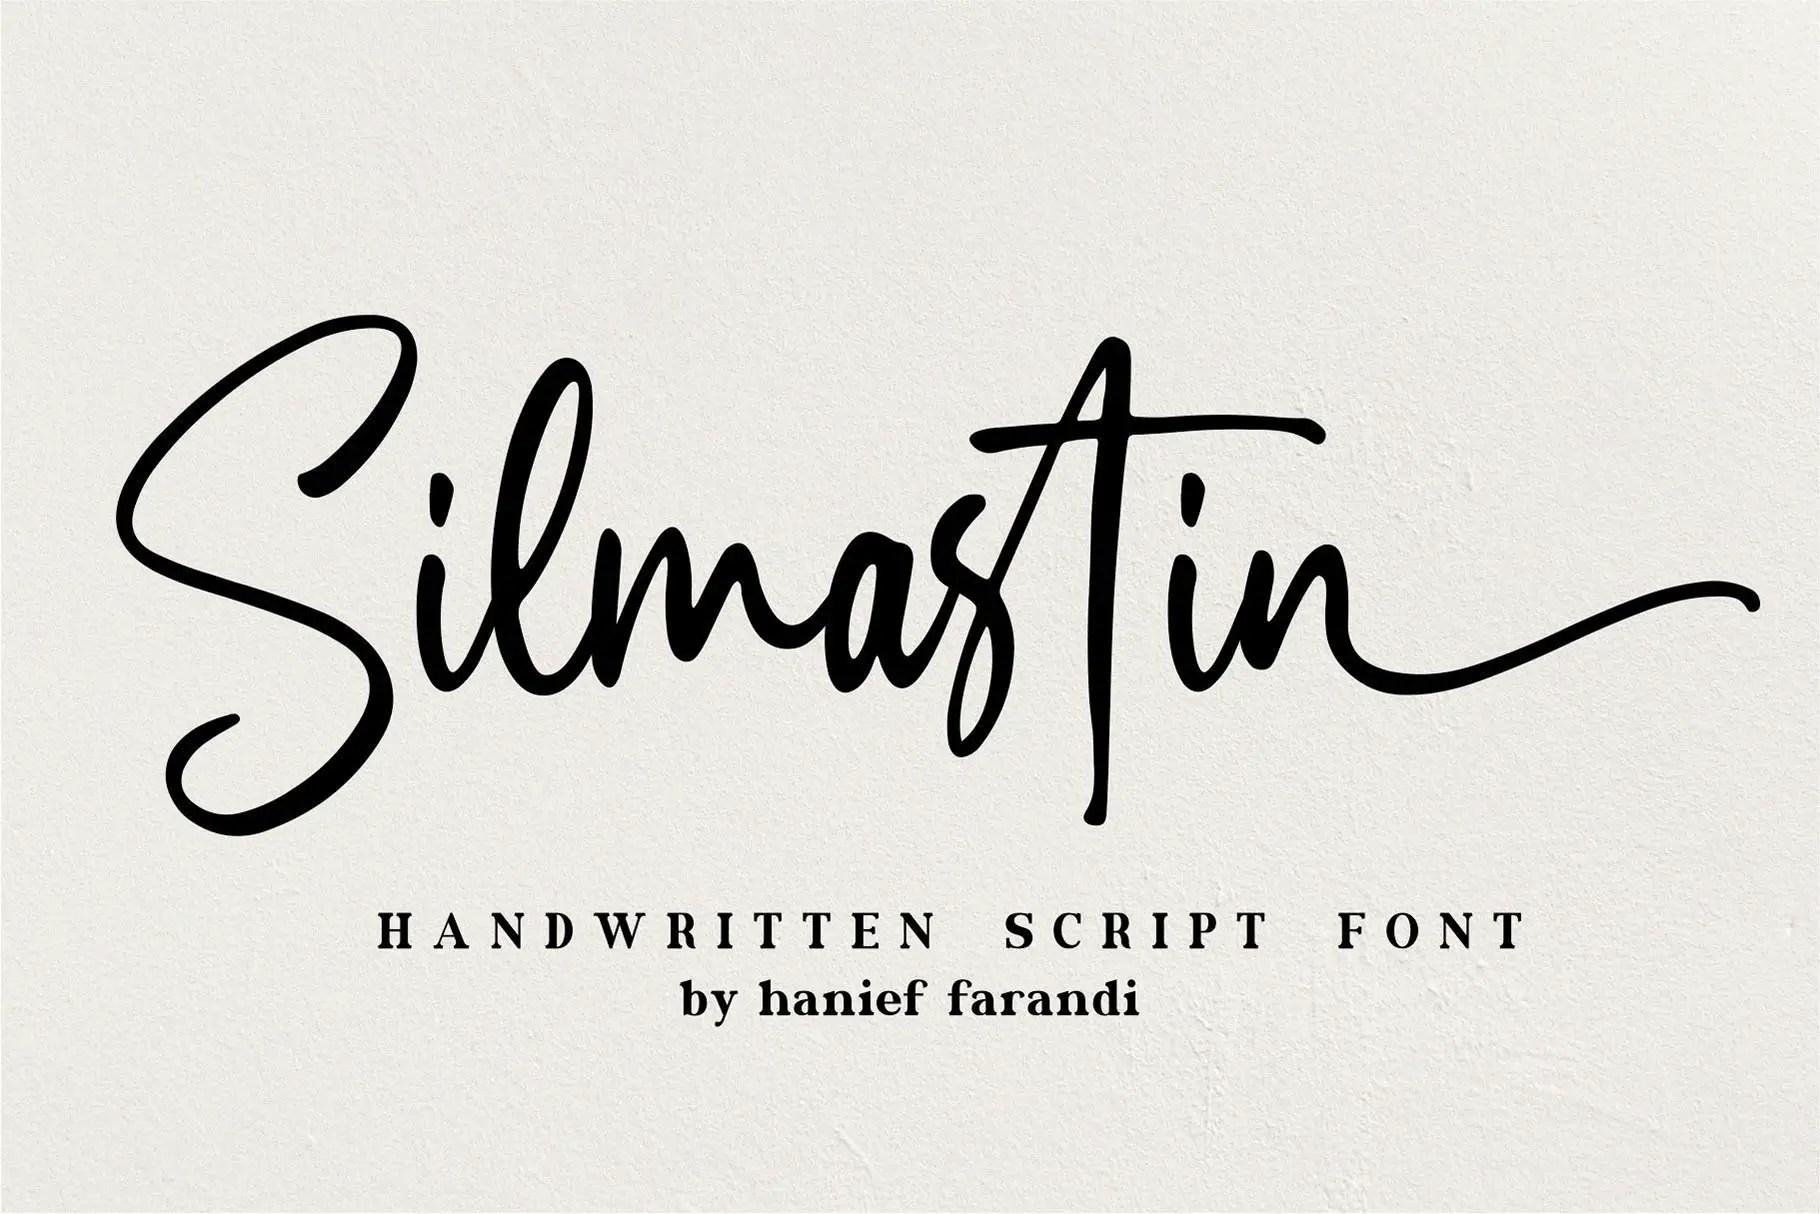 Silmastin - Handwritten Script Font